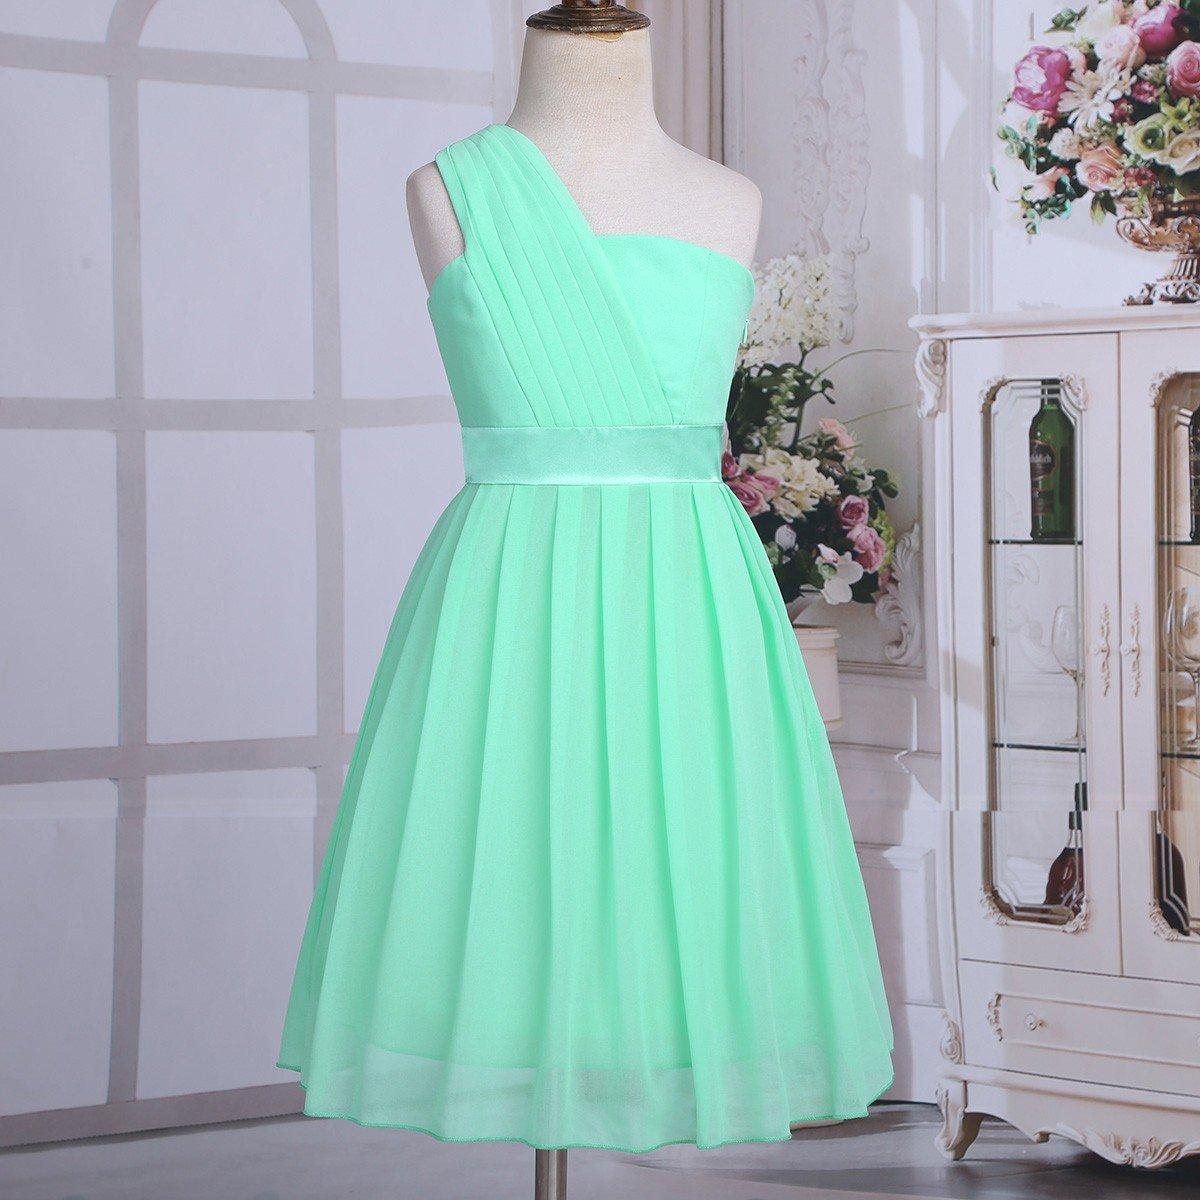 YiZYiF Flower Girls Dress Pleated Chiffon One Shoulder Wedding Bridesmaid Dance Prom Party Dresses